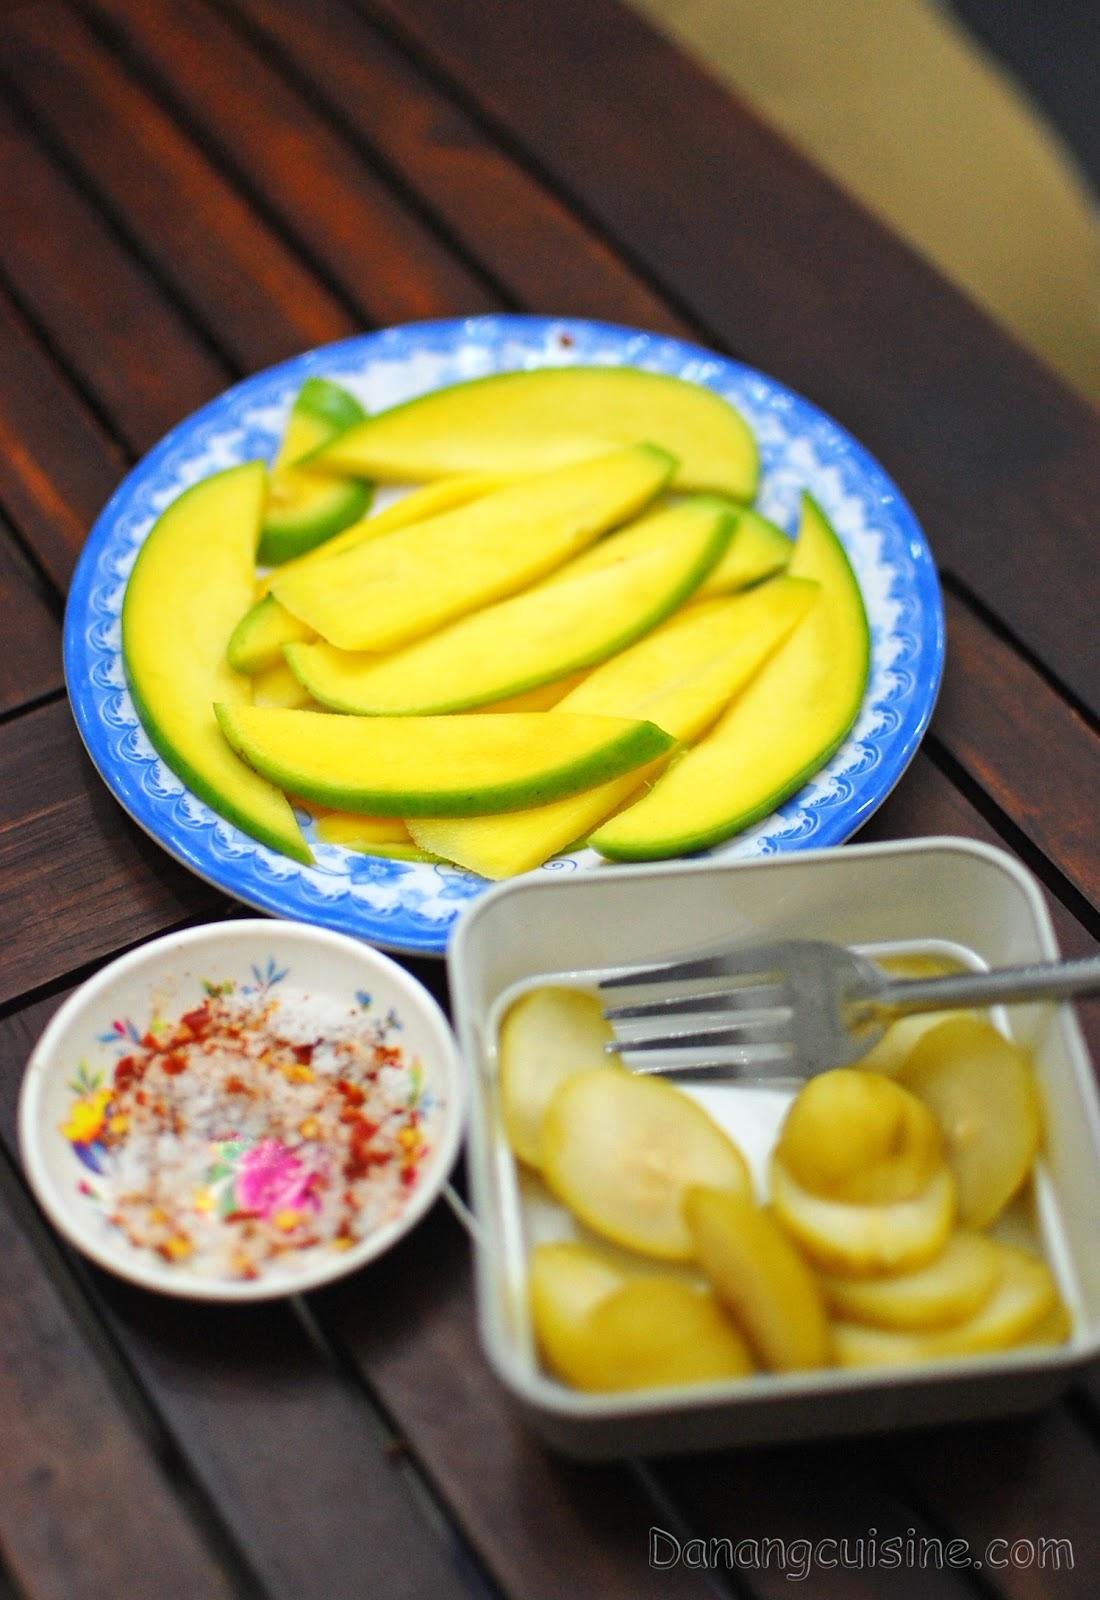 Sour mango and ambarella given for free